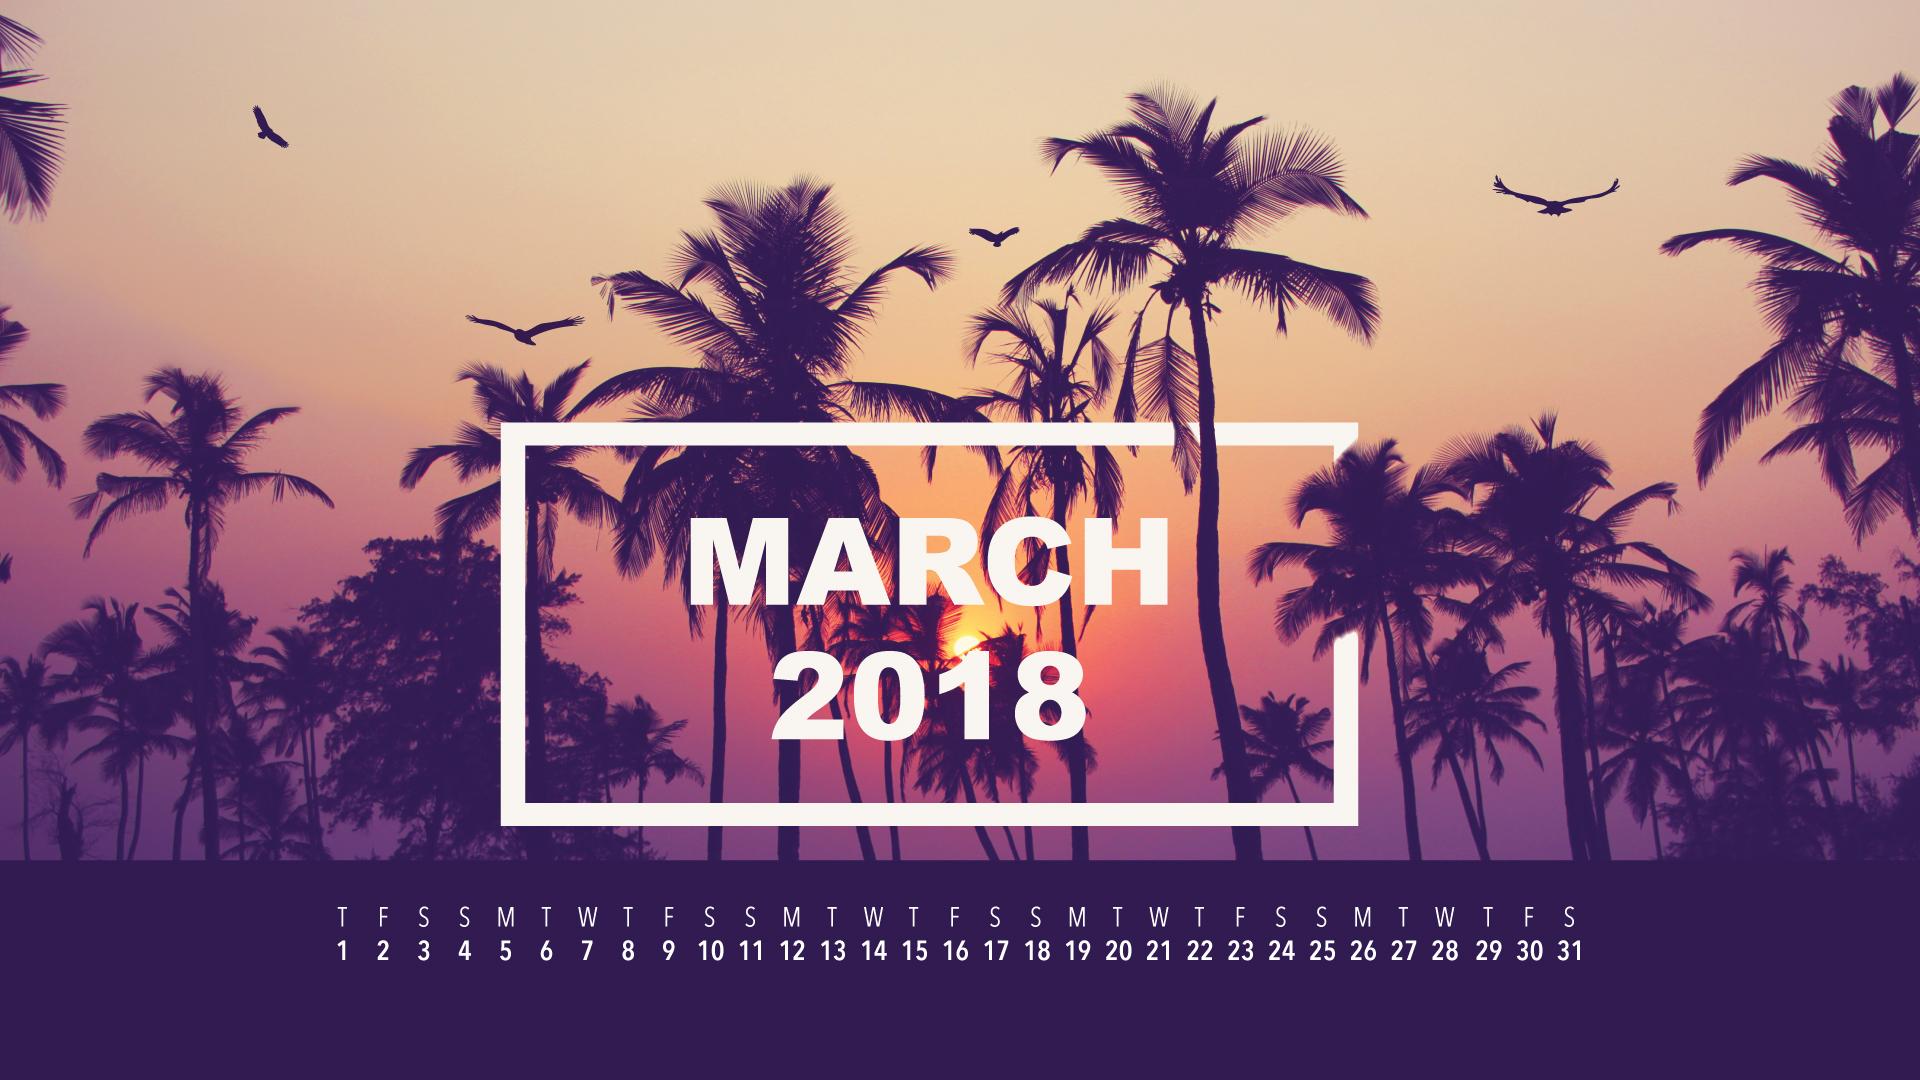 March 2018 Wallpaper